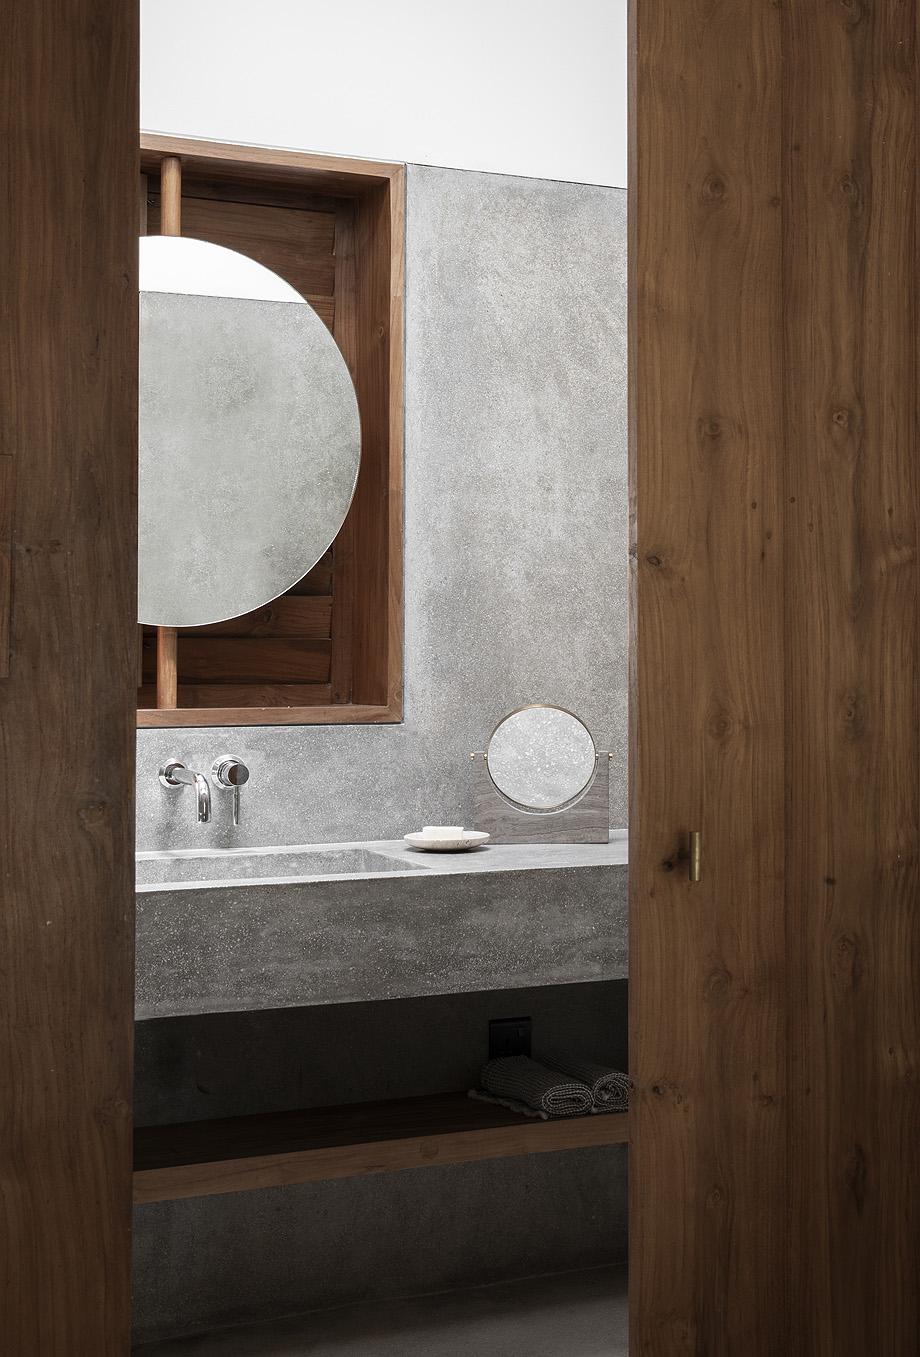 casa k de aim architecture y norm architects - foto jonas bjerre-poulsen y noah sheldon (18) - copia